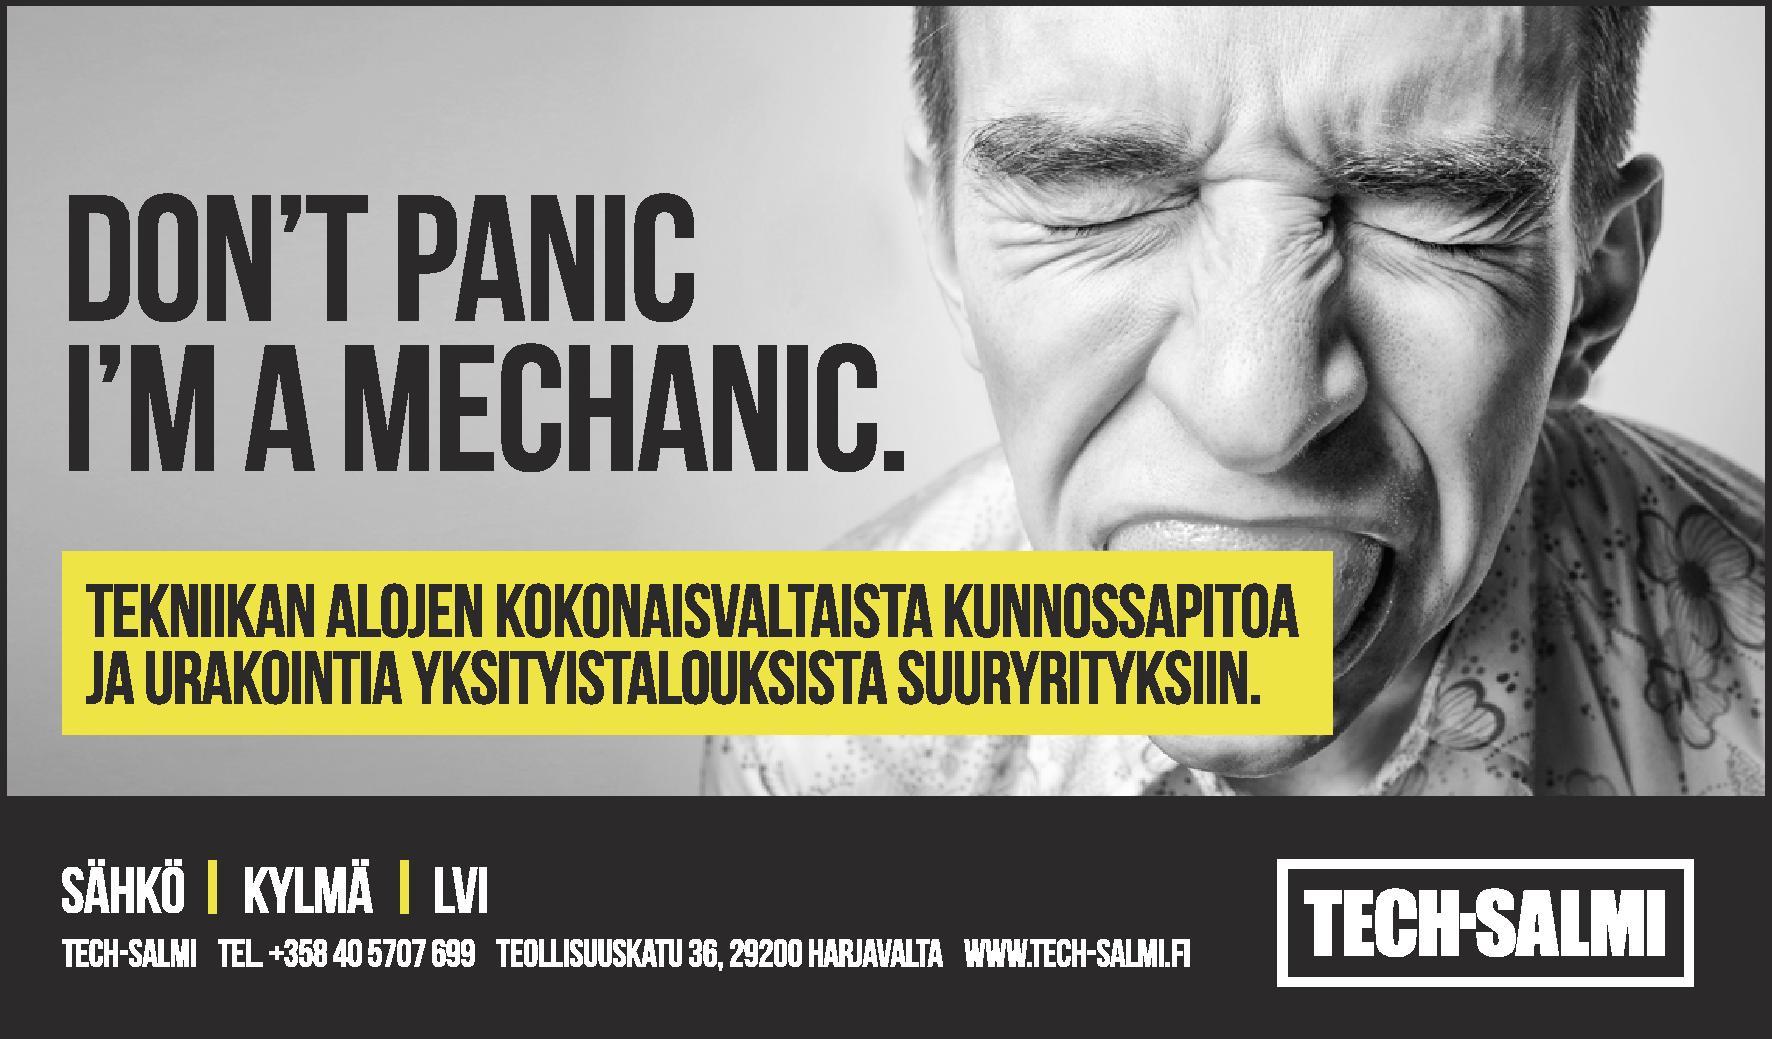 Tech-Salmi